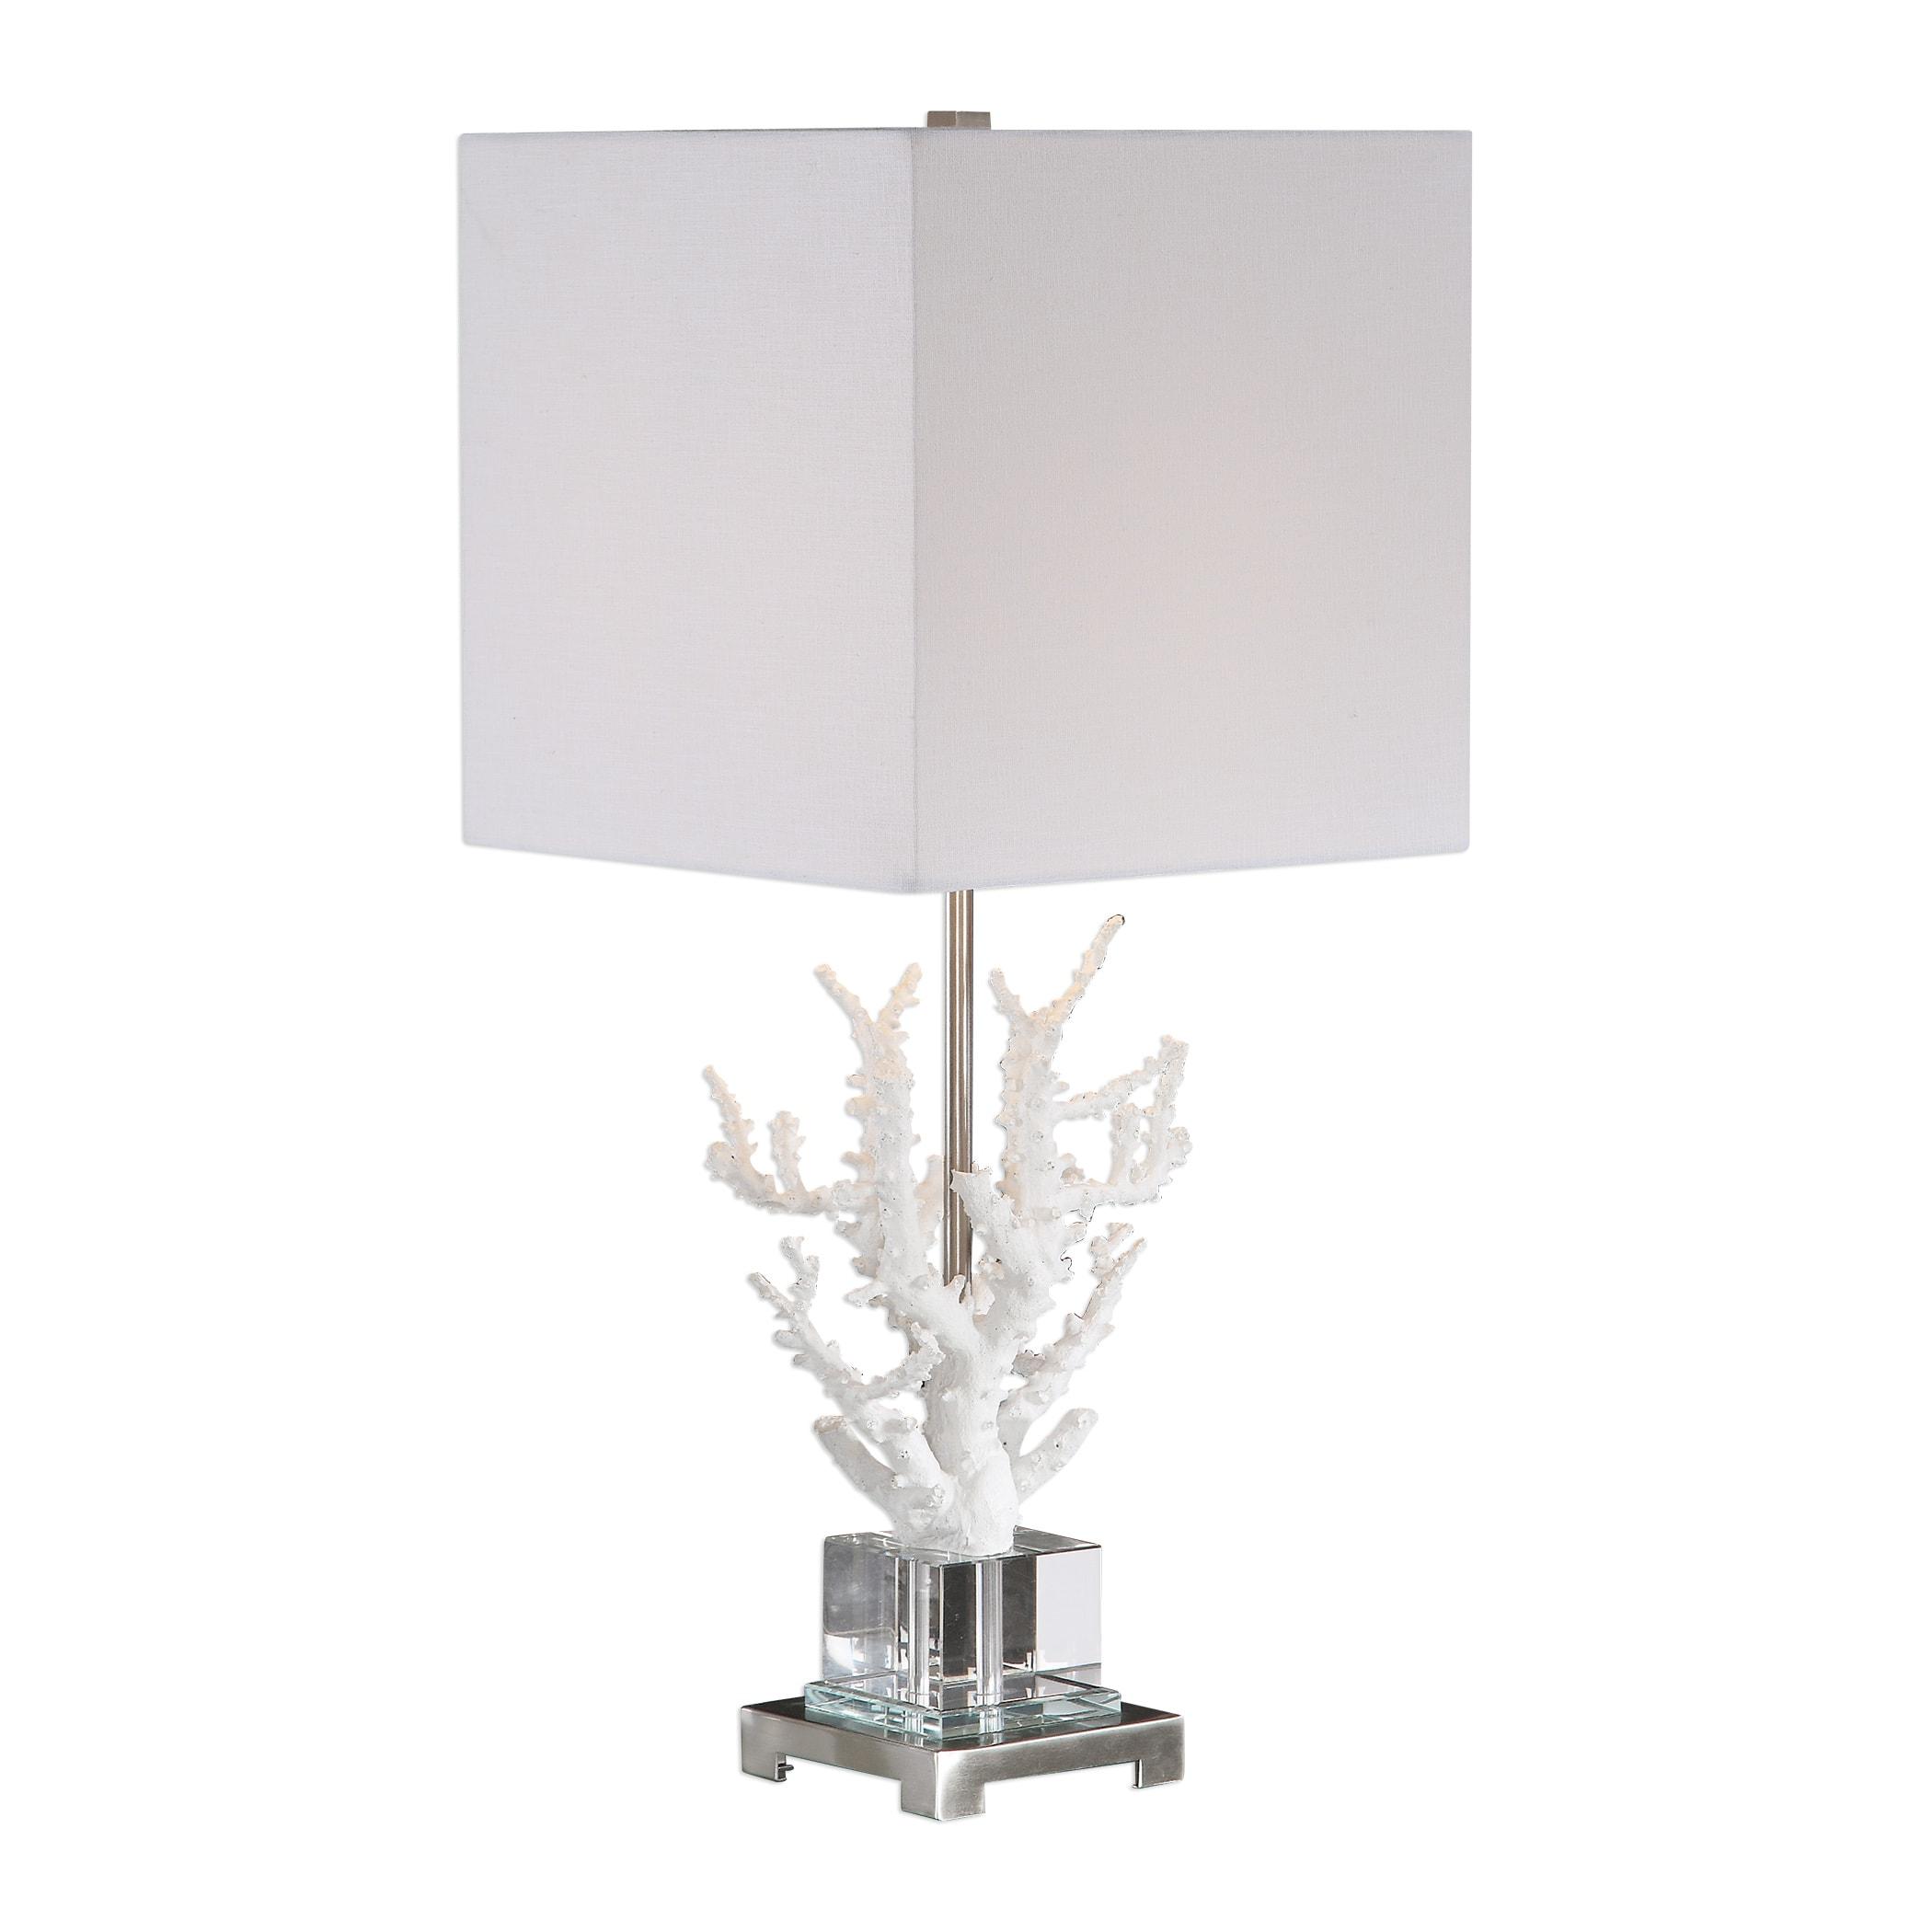 Etonnant Fine Home Lamps